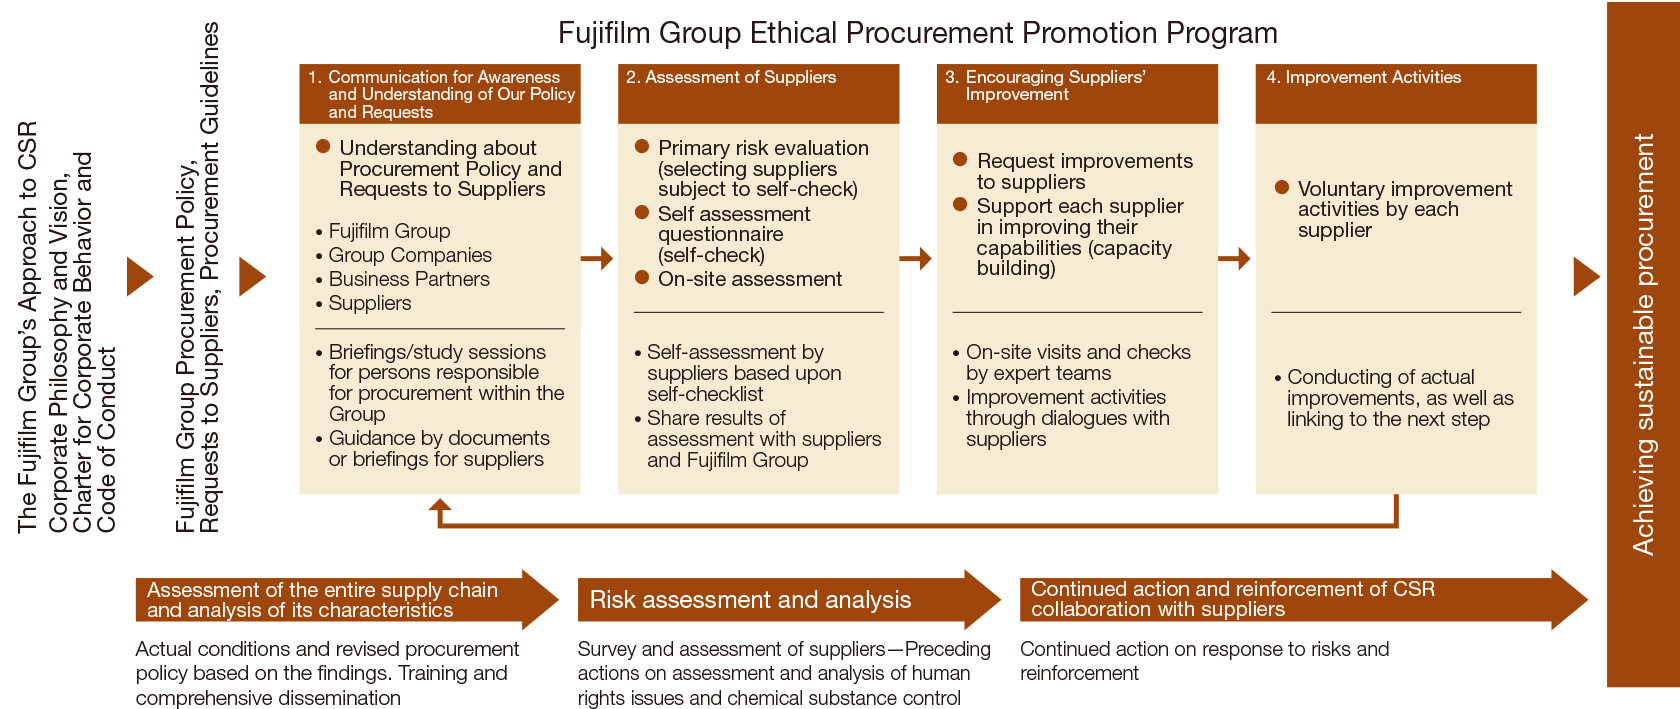 [Image]Fujifilm Group Ethical Procurement Promotion Program